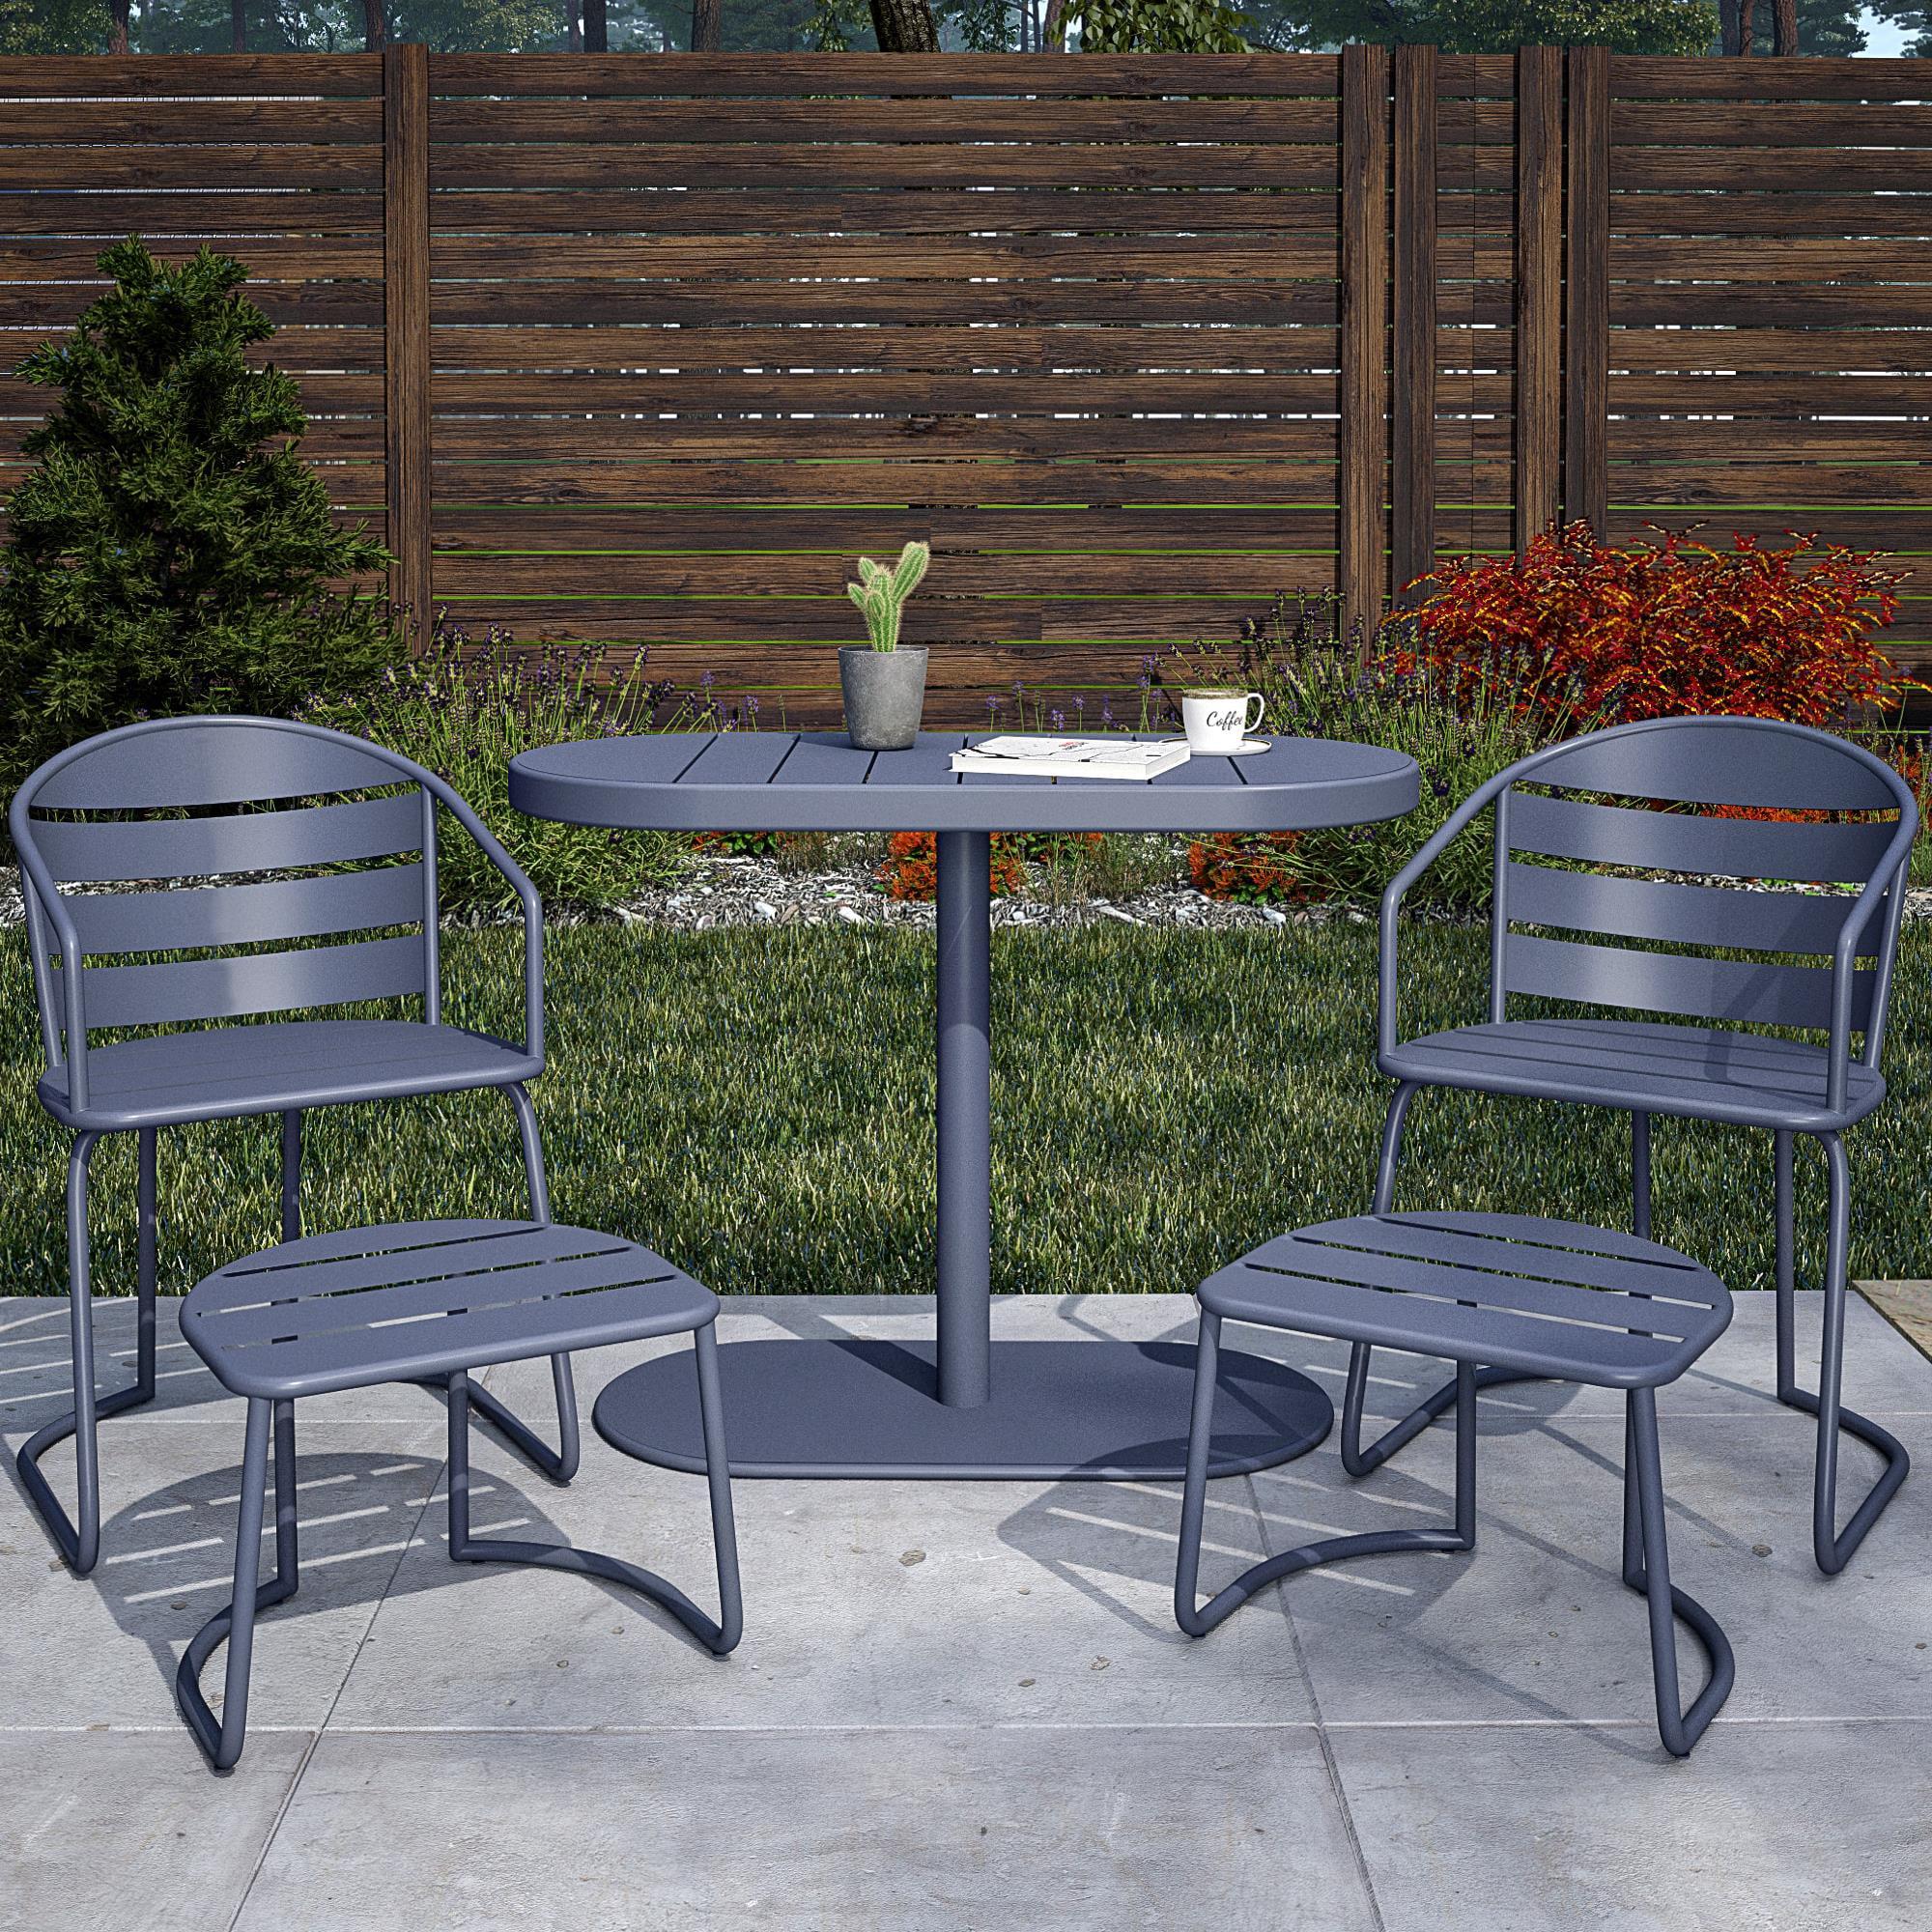 cosco outdoor furniture 5 piece patio bistro set 2 bistro chairs 2 ottomans bistro table steel gray gray